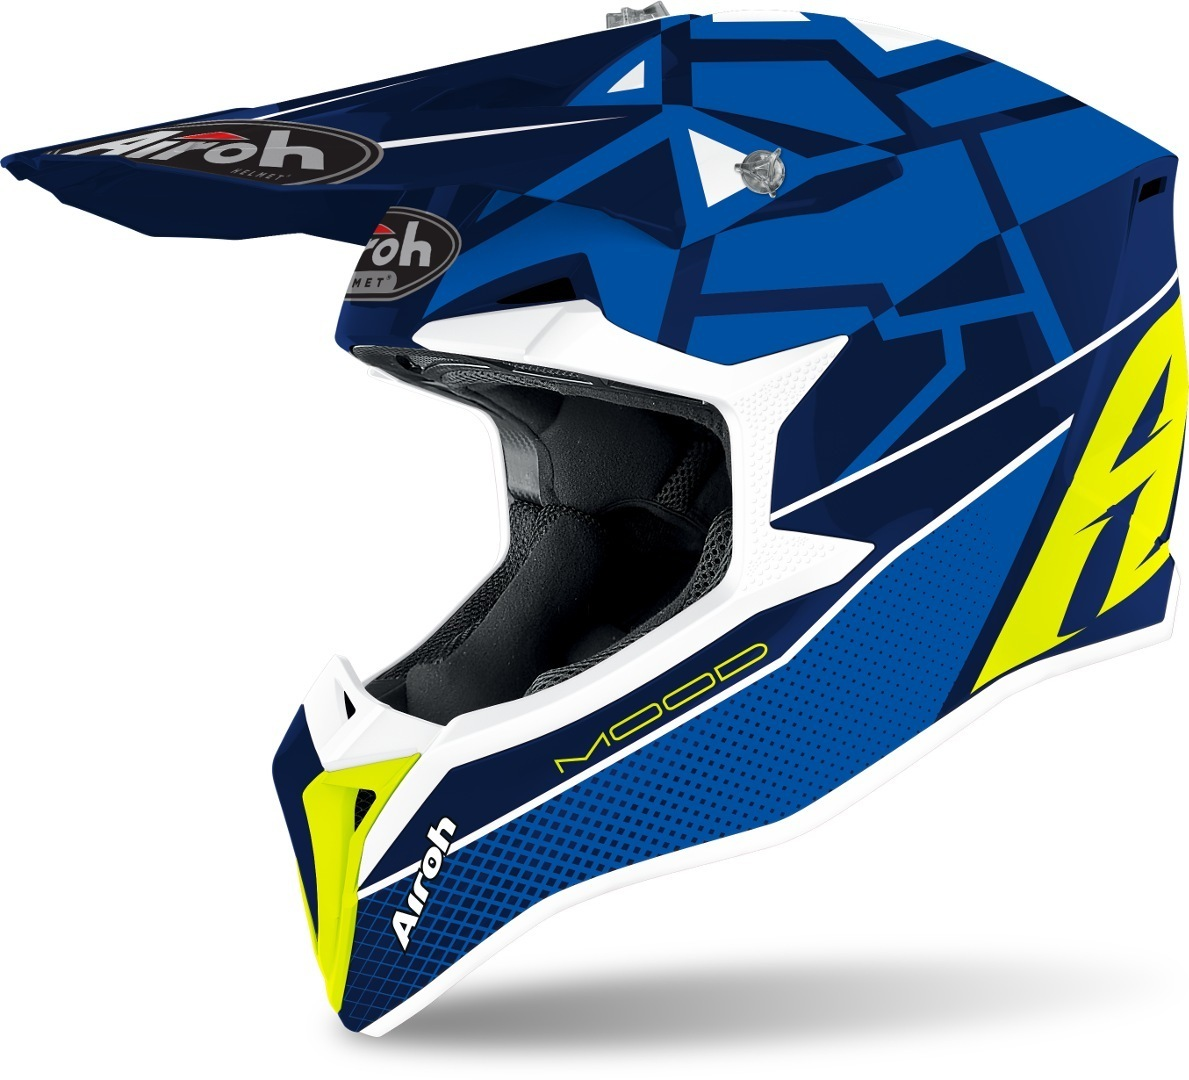 Airoh Wraap Mood Motocross Helm, blau, Größe M, blau, Größe M